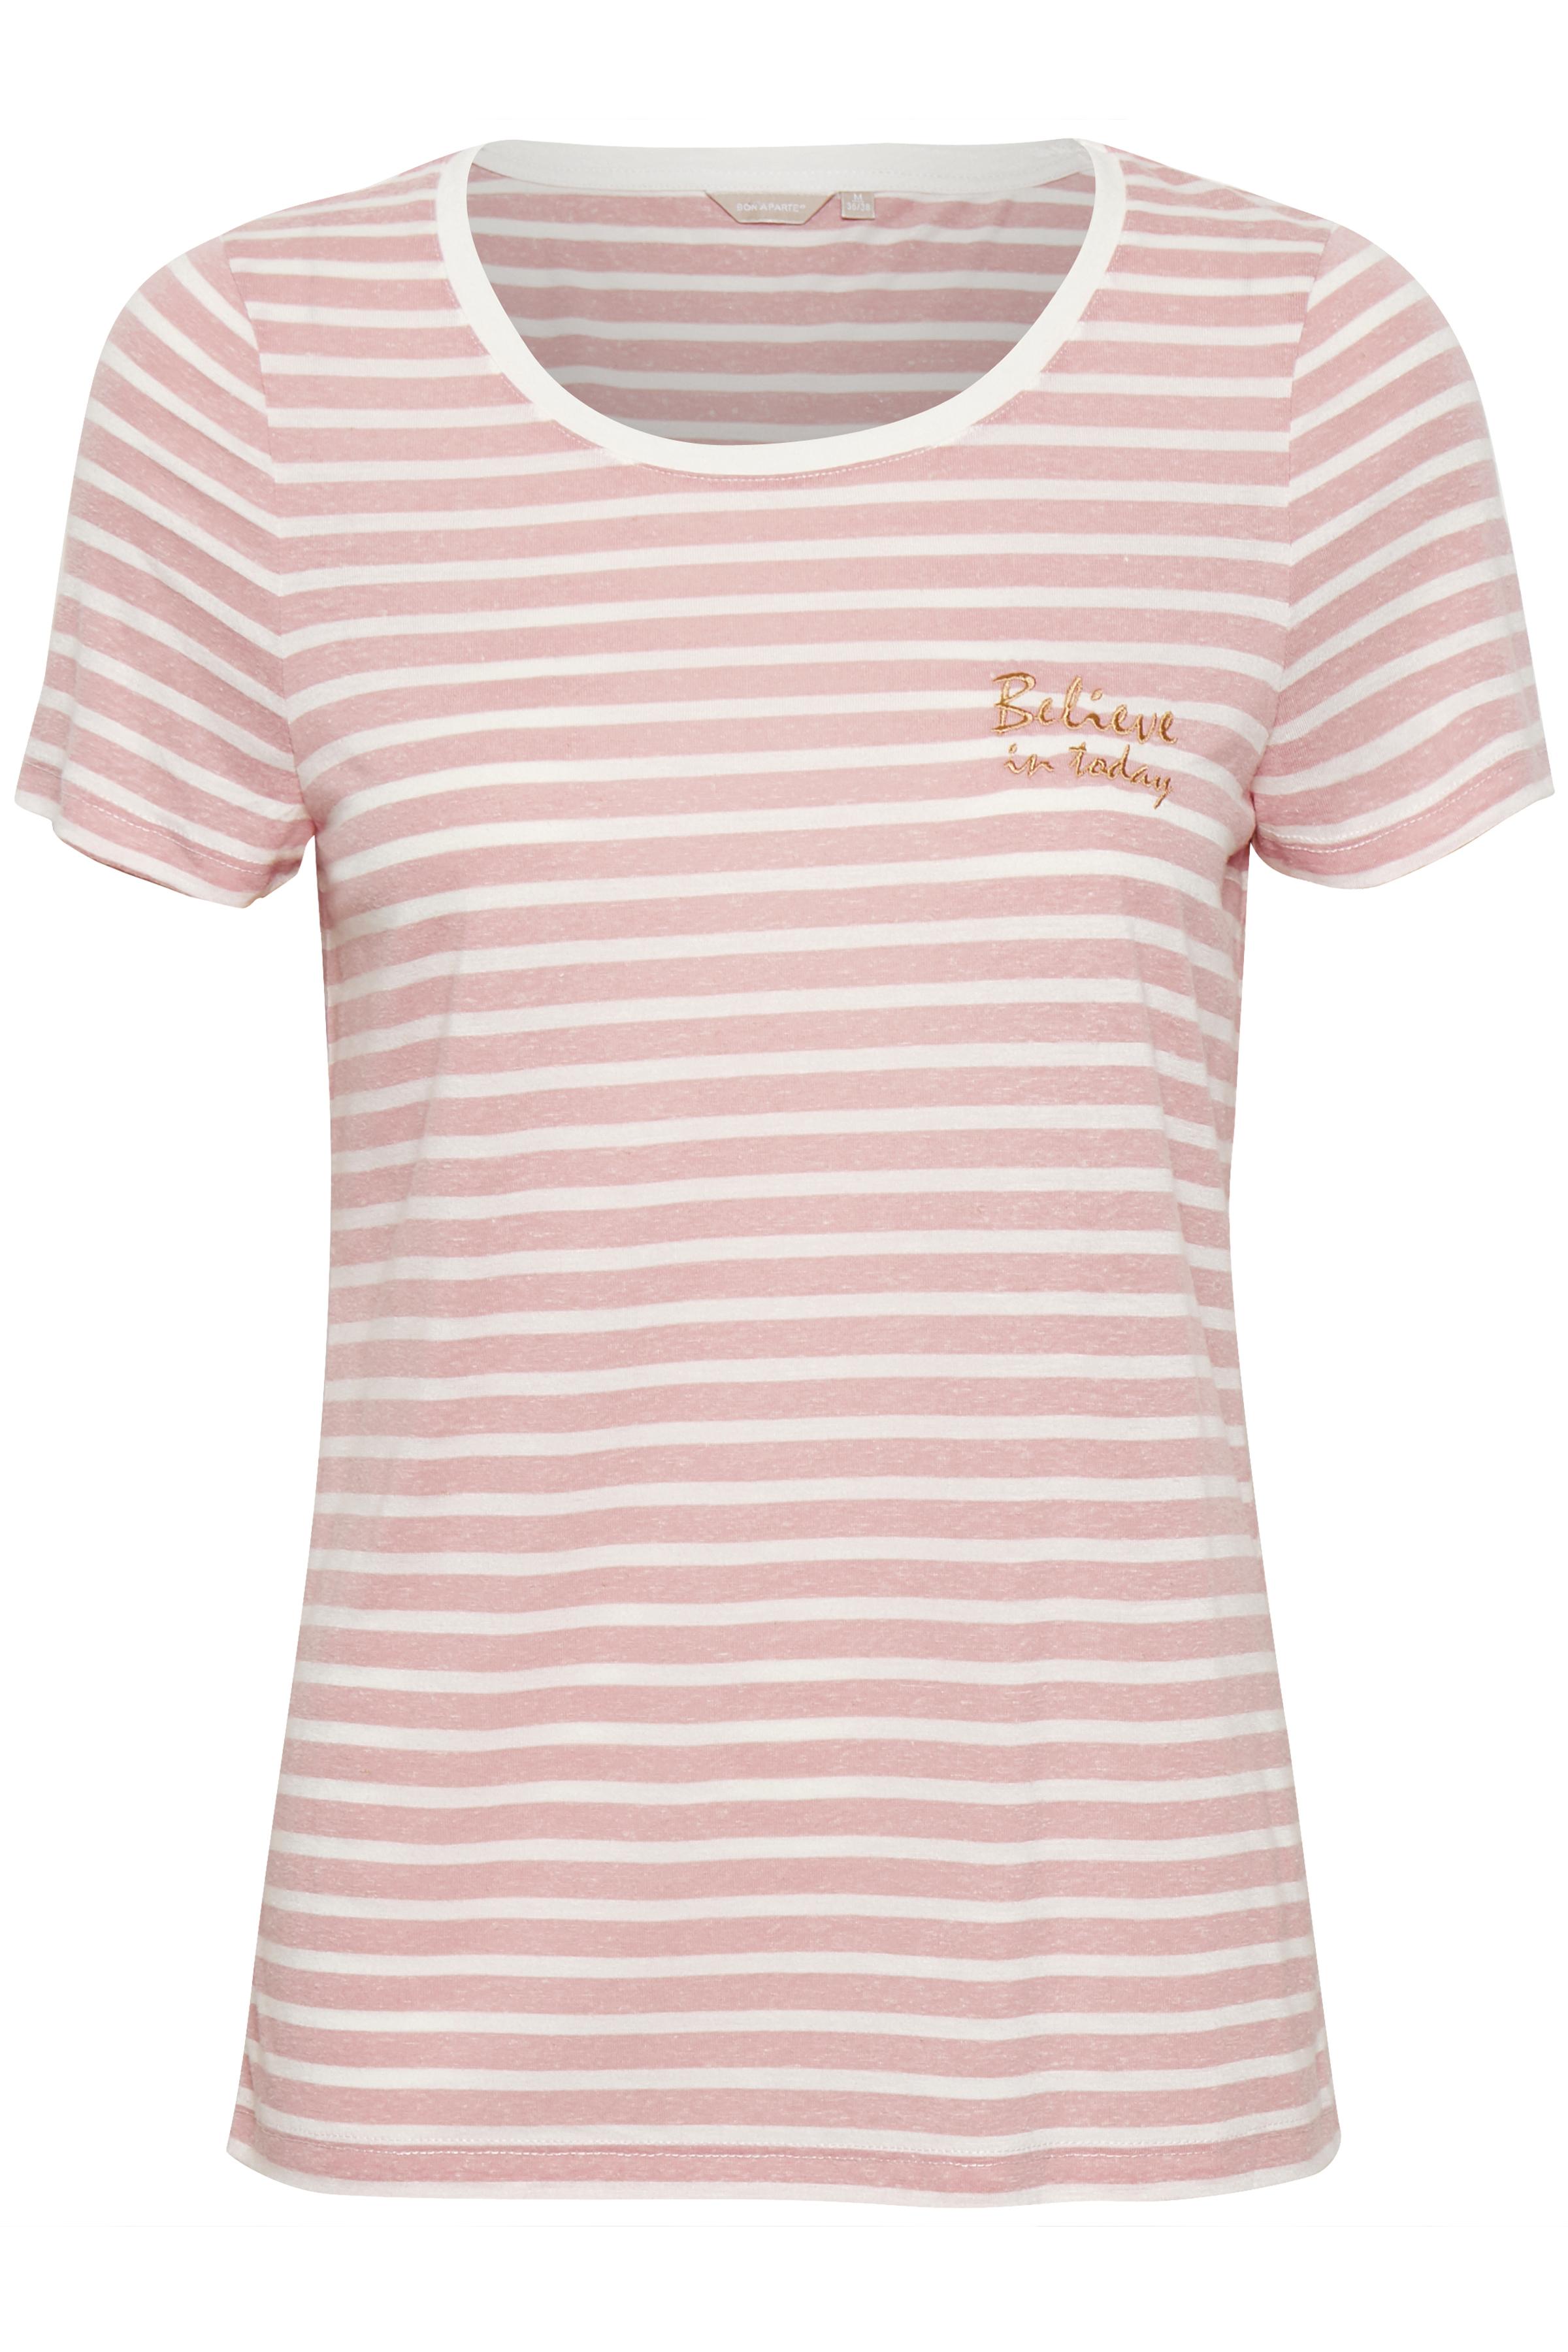 Image of BonA Parte Dame T-shirt - Rosameleret/off-white